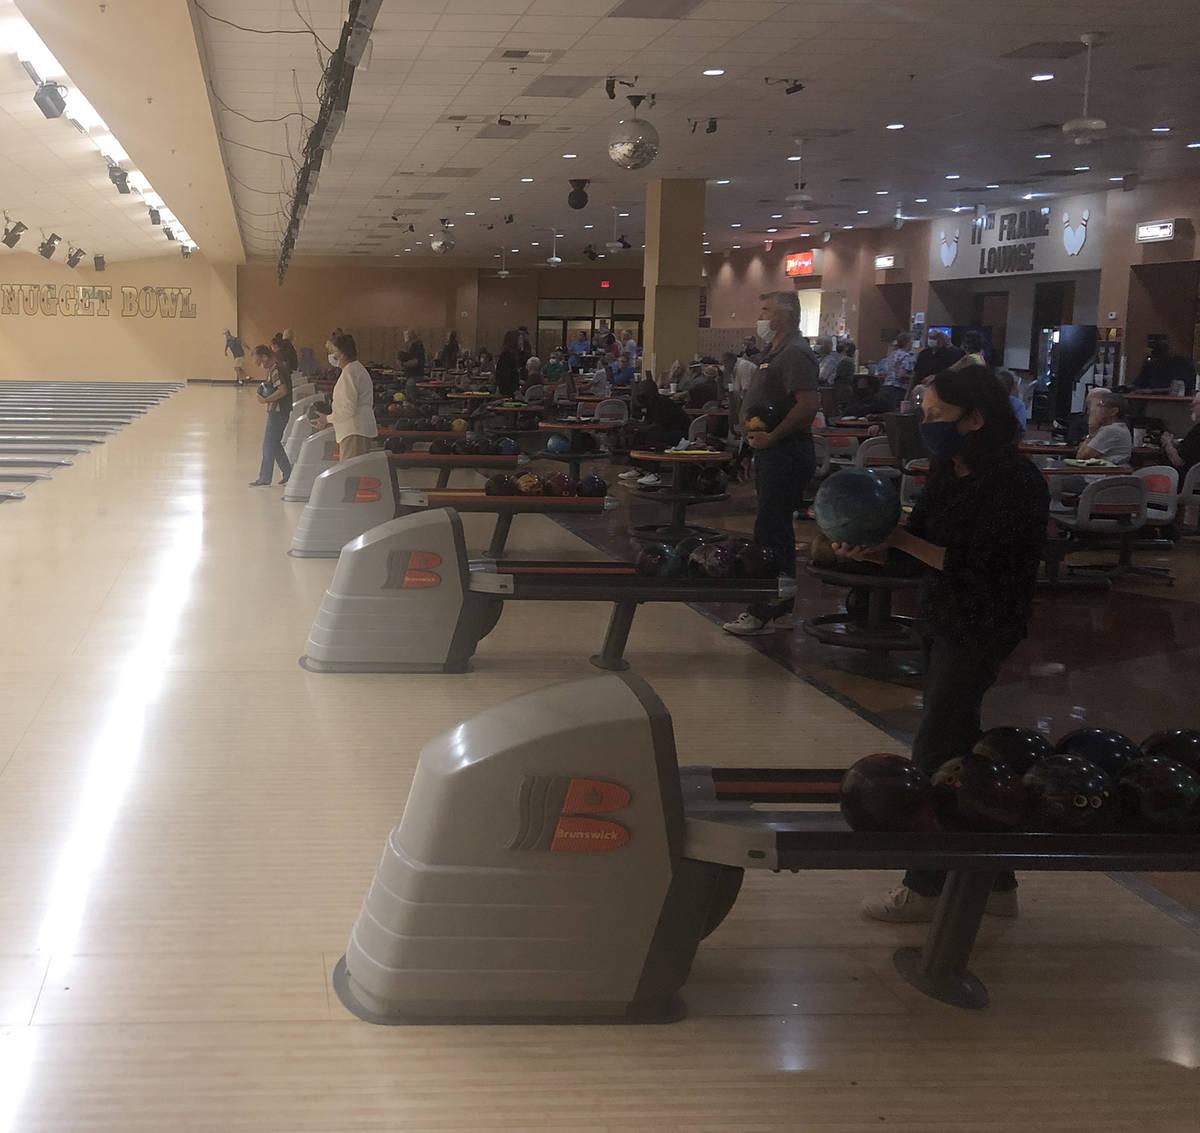 Tom Rysinski/Pahrump Valley Times The Pahrump Valley Tournament Bowling Club's Saturday event d ...